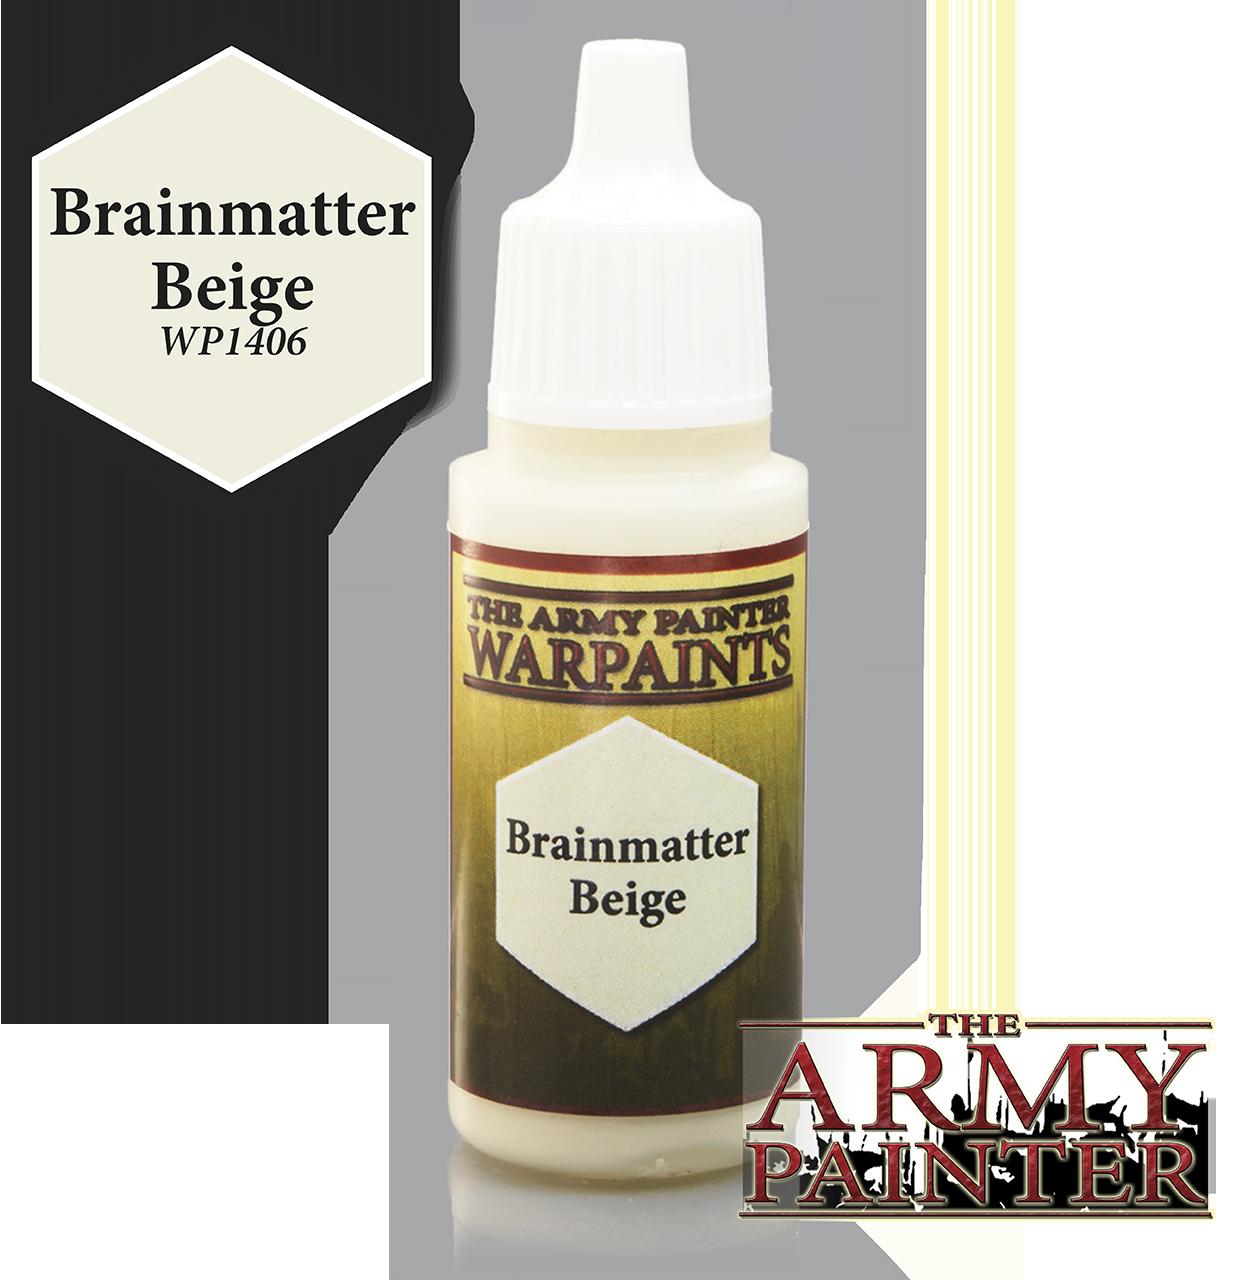 Brainmatter Beige - Army Painter Warpaints WP1406